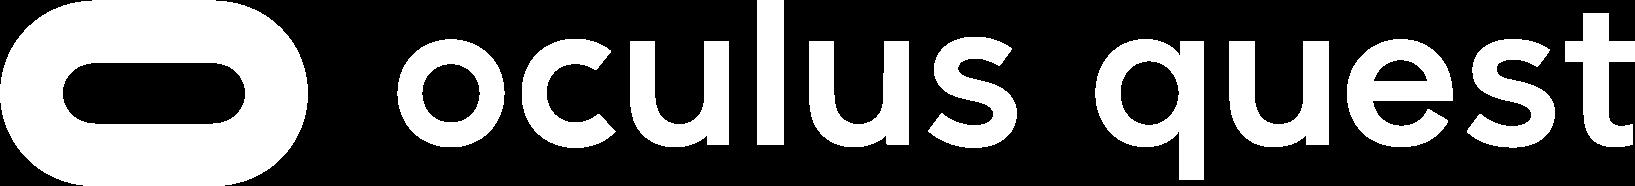 oculusquest-new